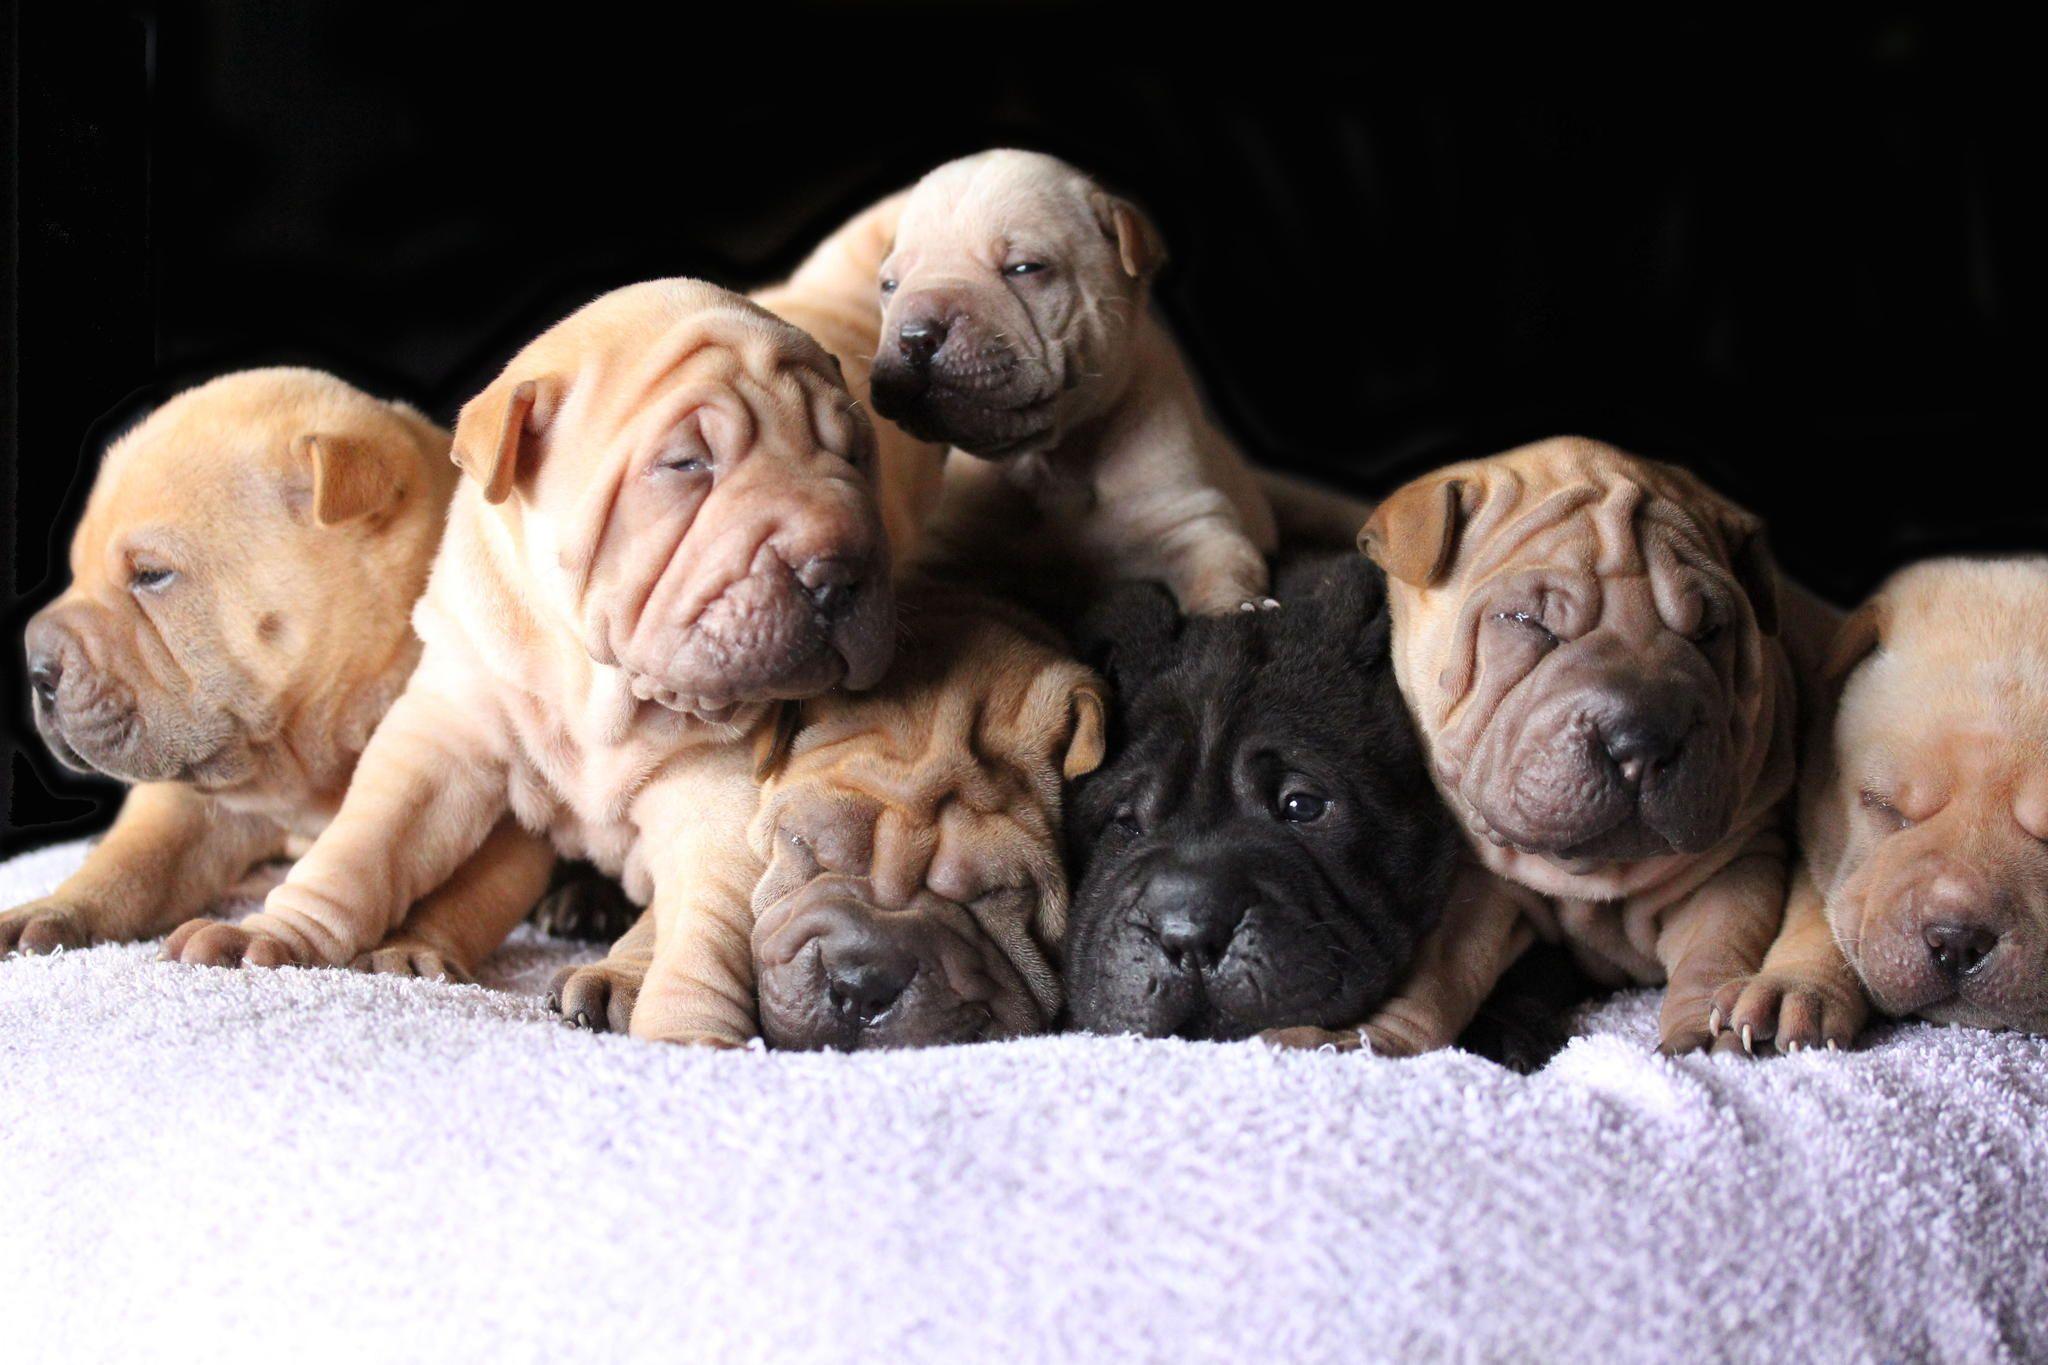 Puppies to go! Puppies to go! Puppies, Pet